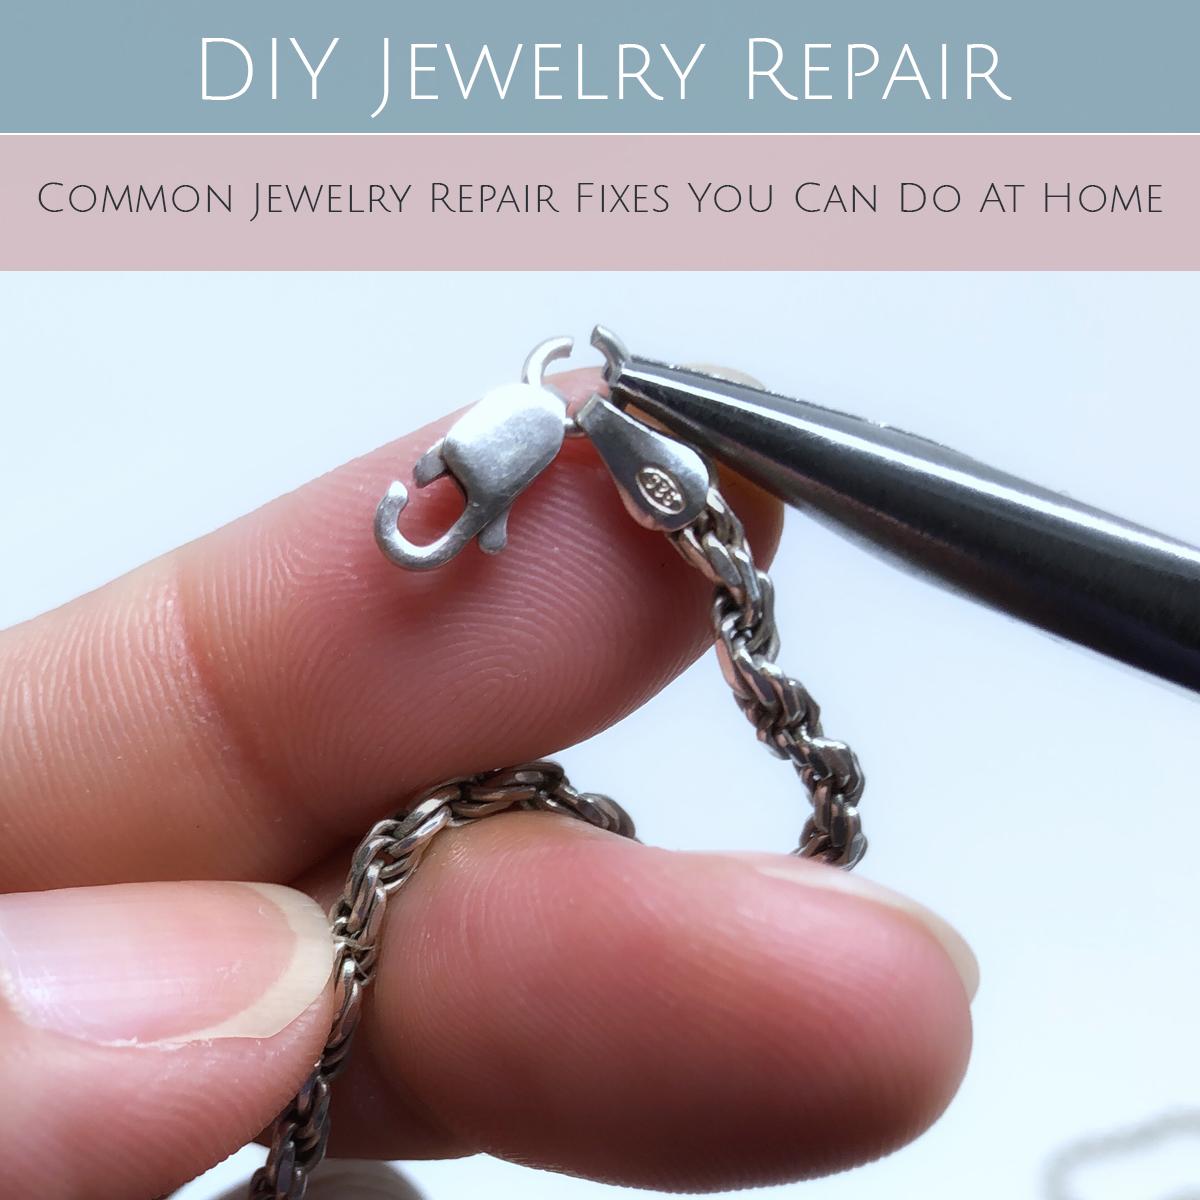 DIY_Jewelry_Repair.jpg